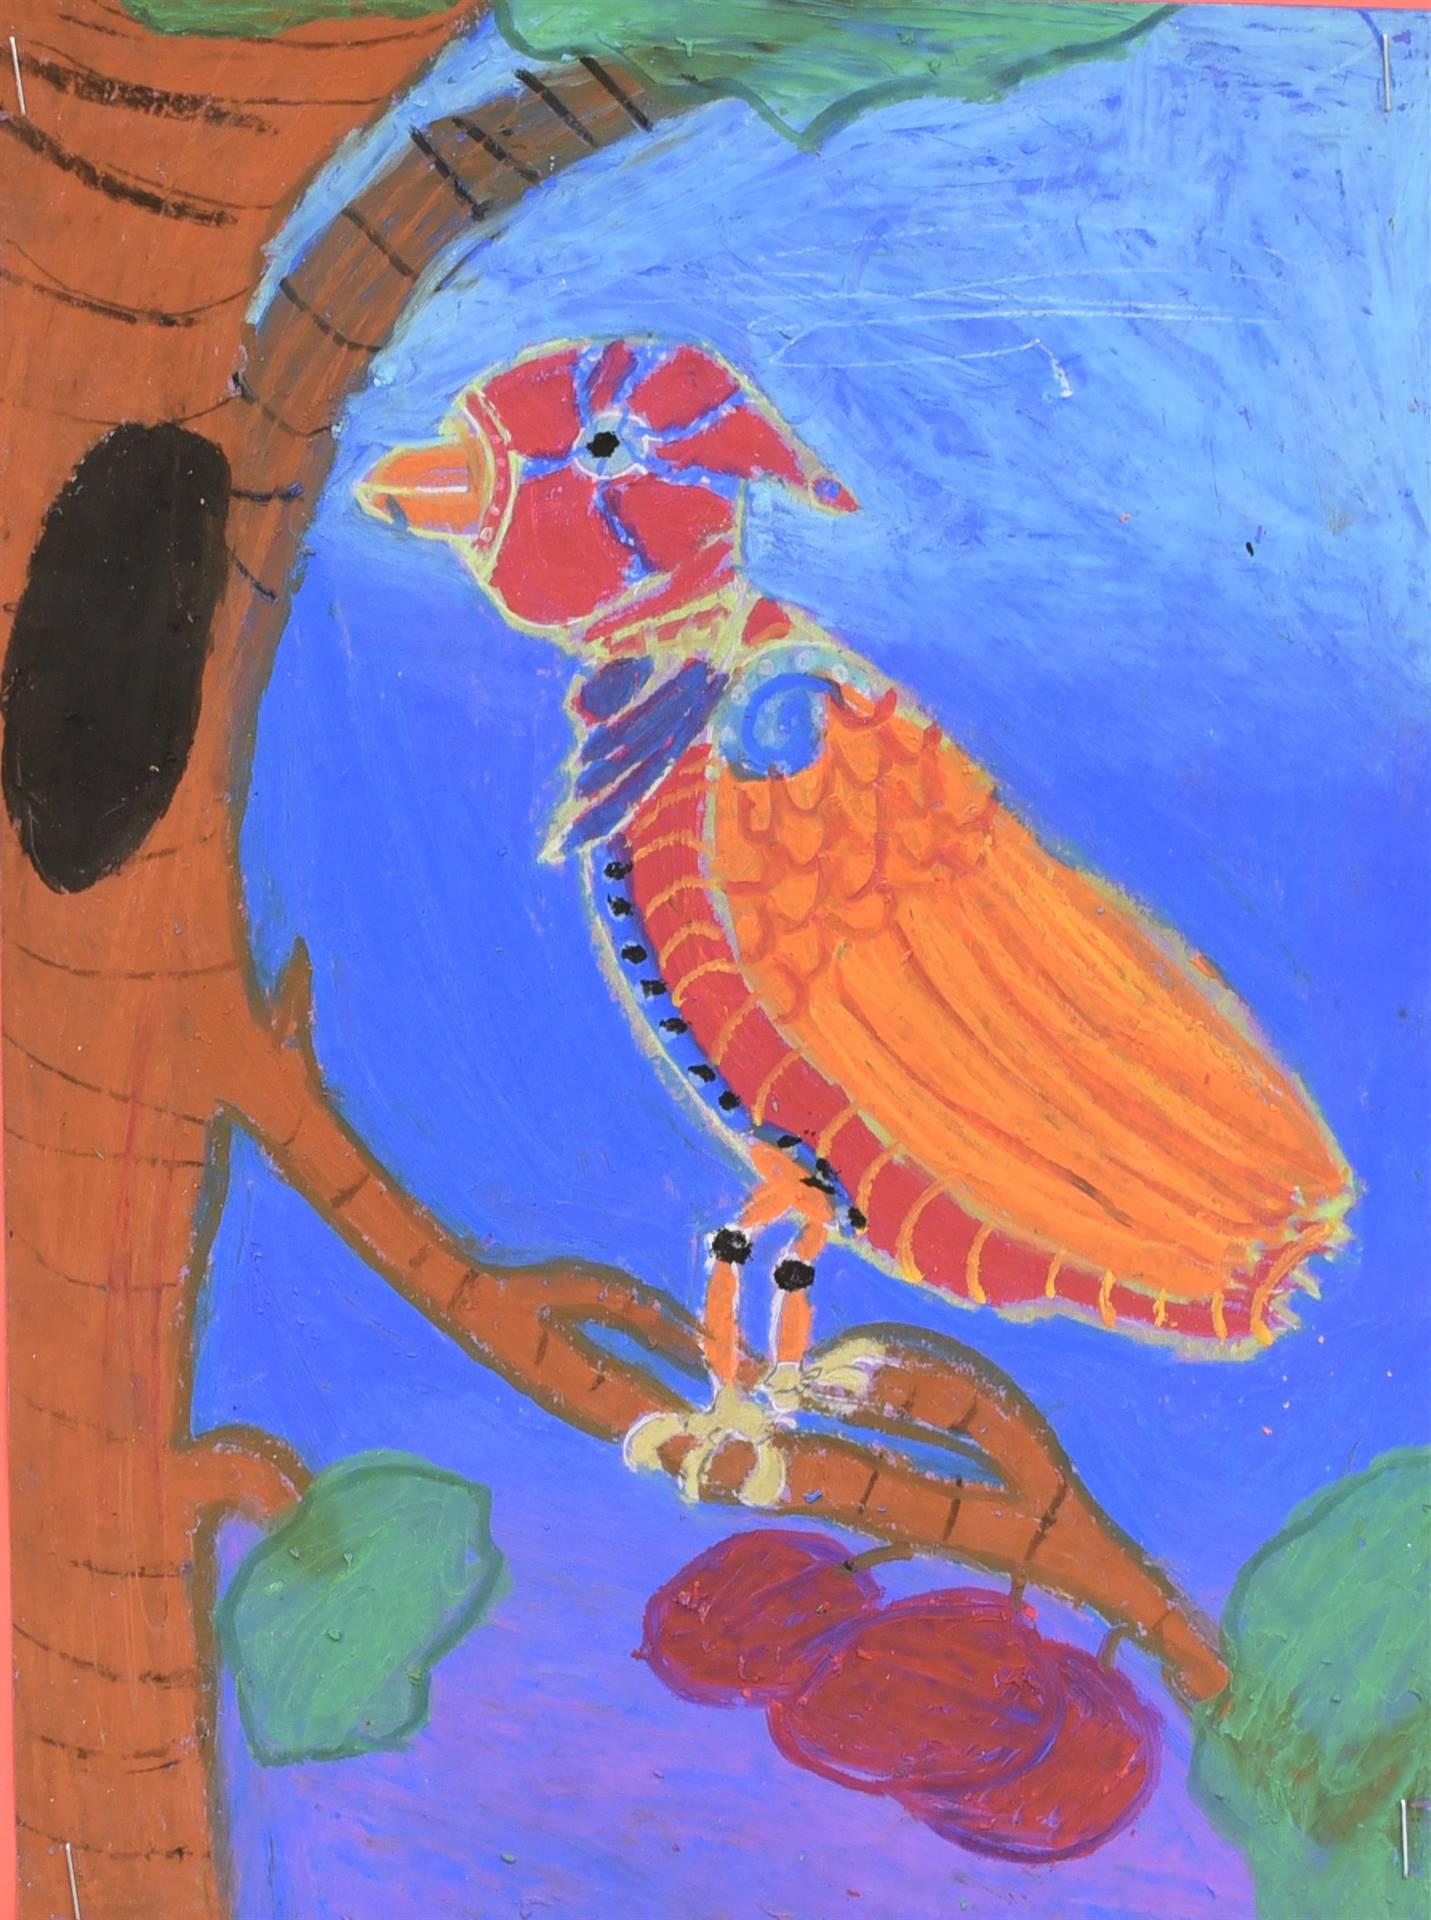 Brecksville-Broadview Hts. Middle School Art Projects 108